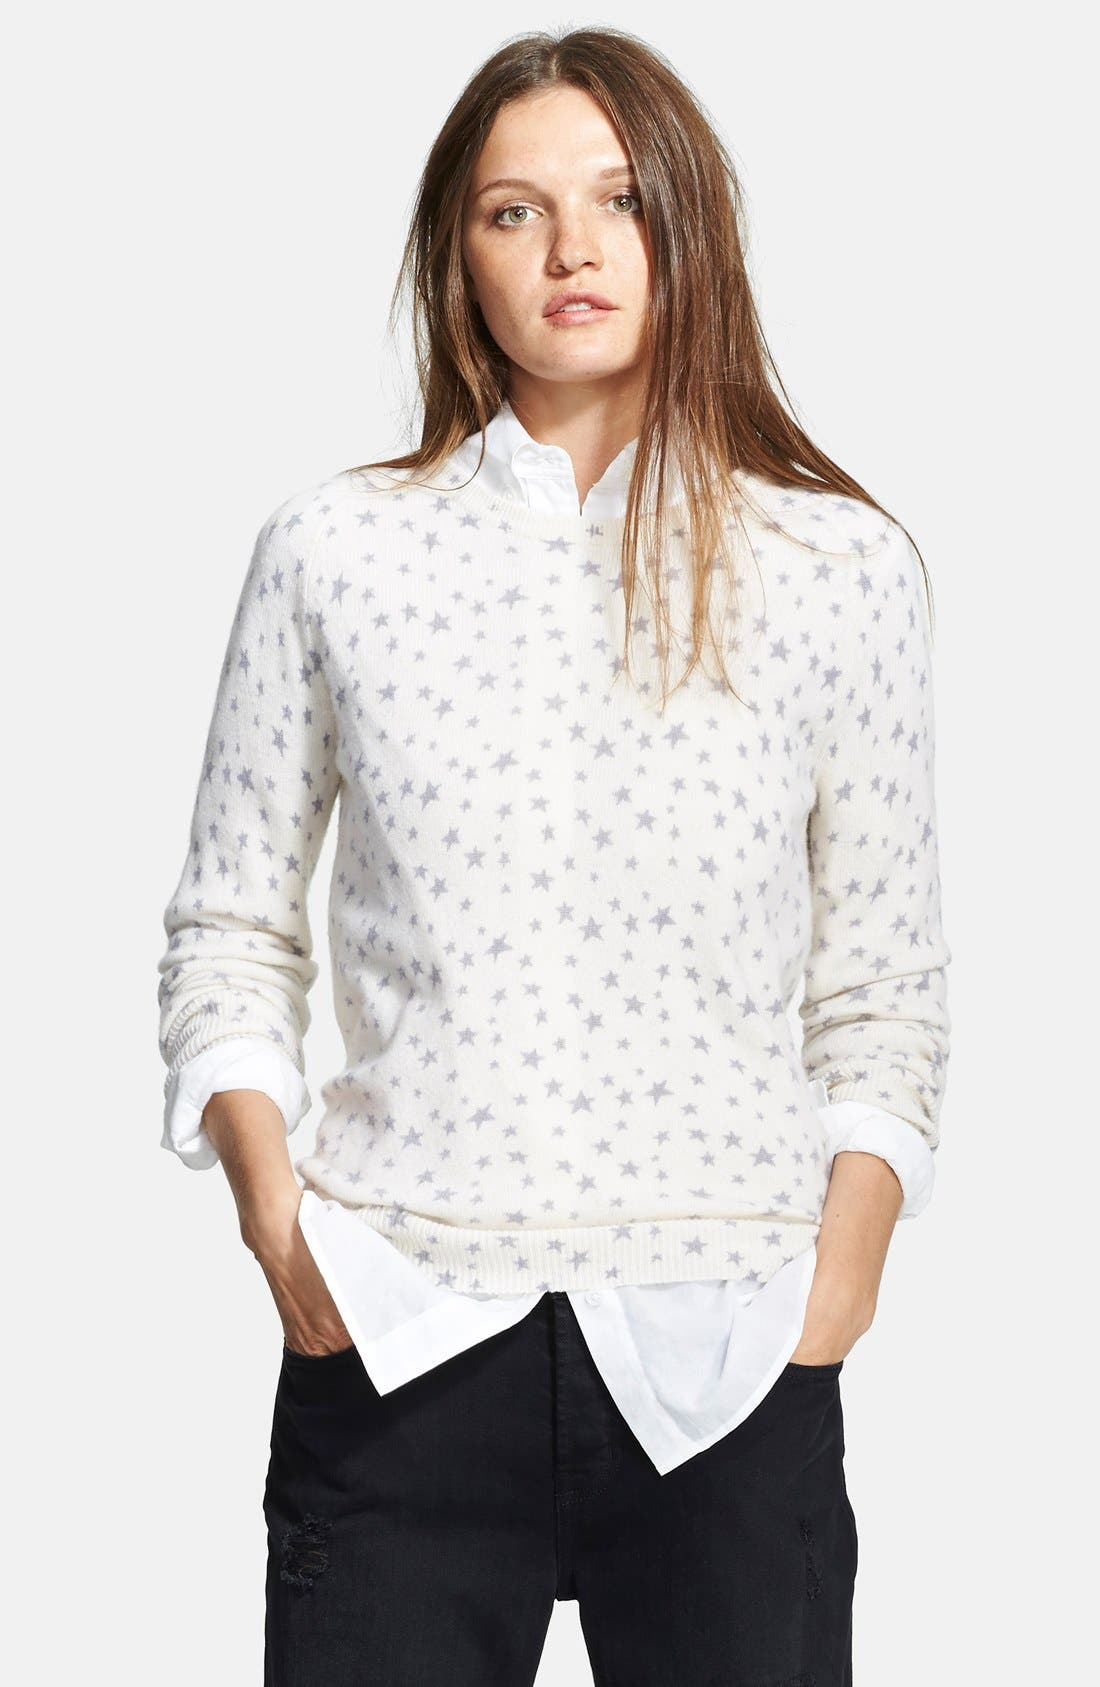 Main Image - Equipment 'Sloane' Cashmere Crewneck Sweater